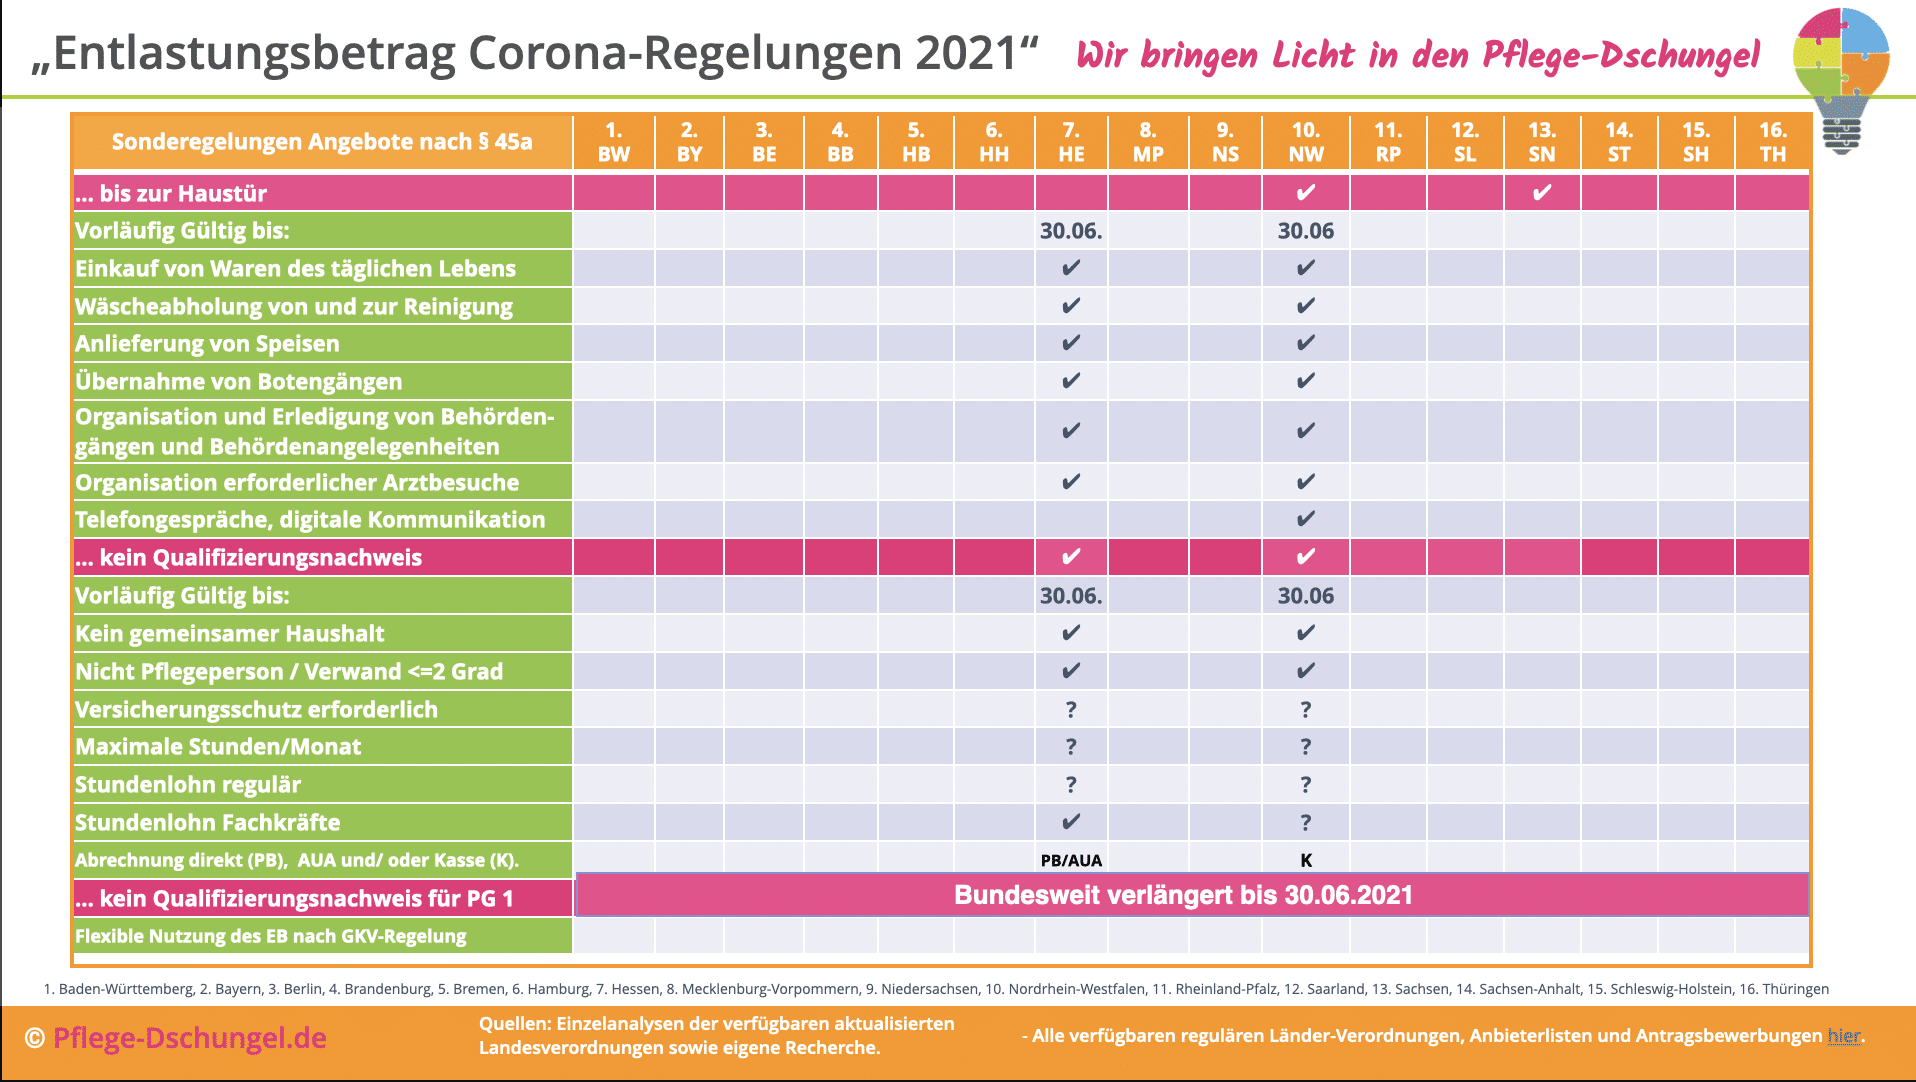 Entlastungsbetrag Corona 2021 Sommer